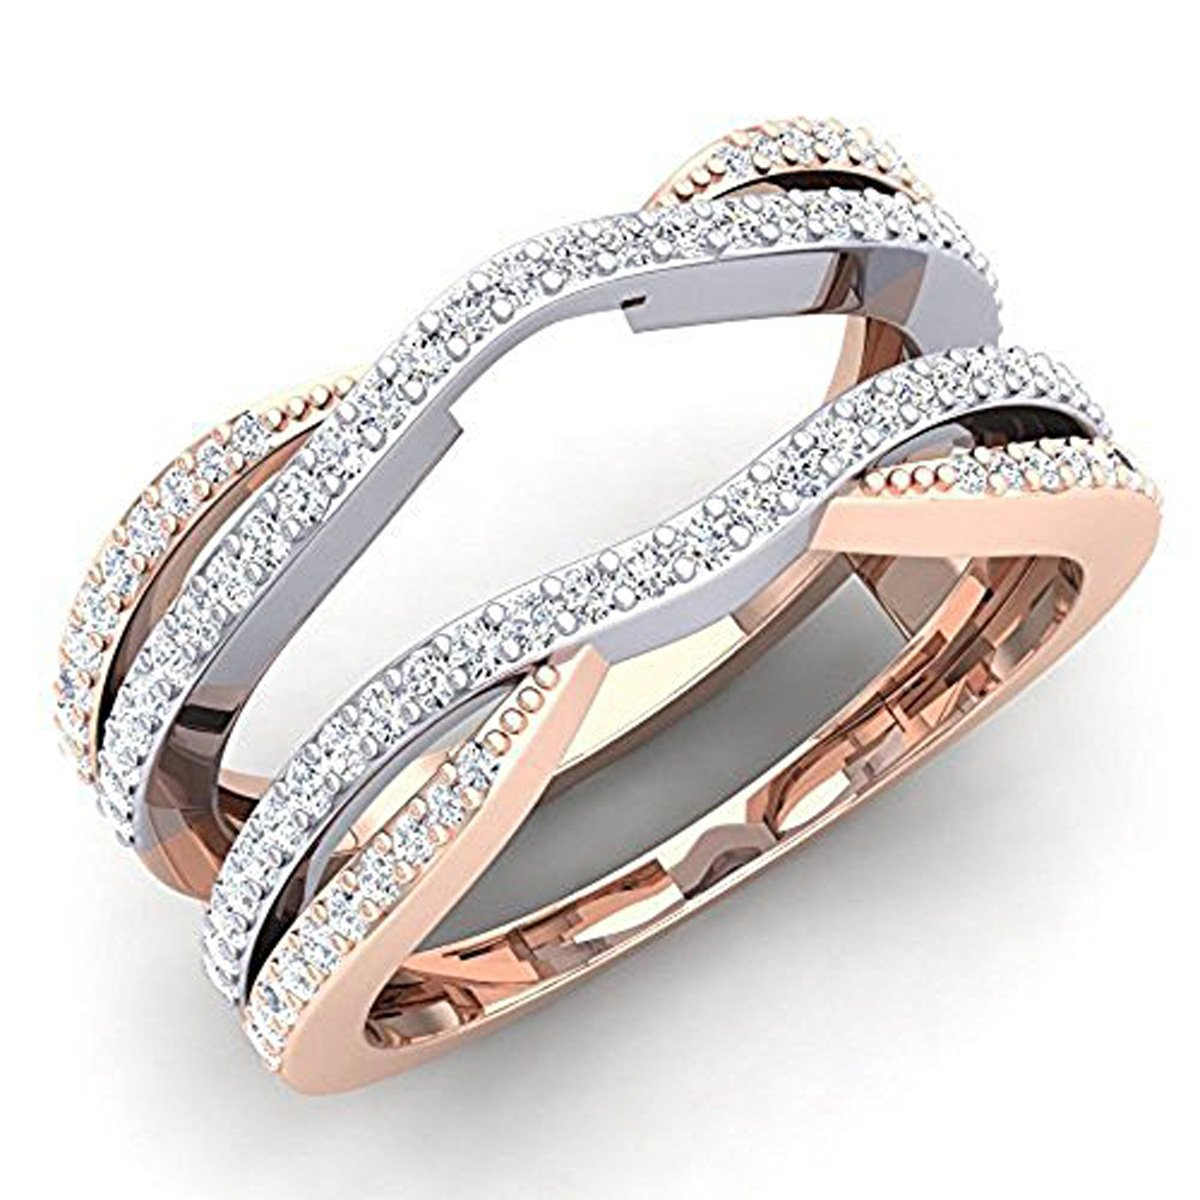 Jewelryhub 0.50 Ctw 14K White & Rose Gold Two-Tone Plated Round Cut White CZ Diamond Ladies Anniversary Wedding Band Enhancer Guard Double Chevron Ring (5.5) Alloy